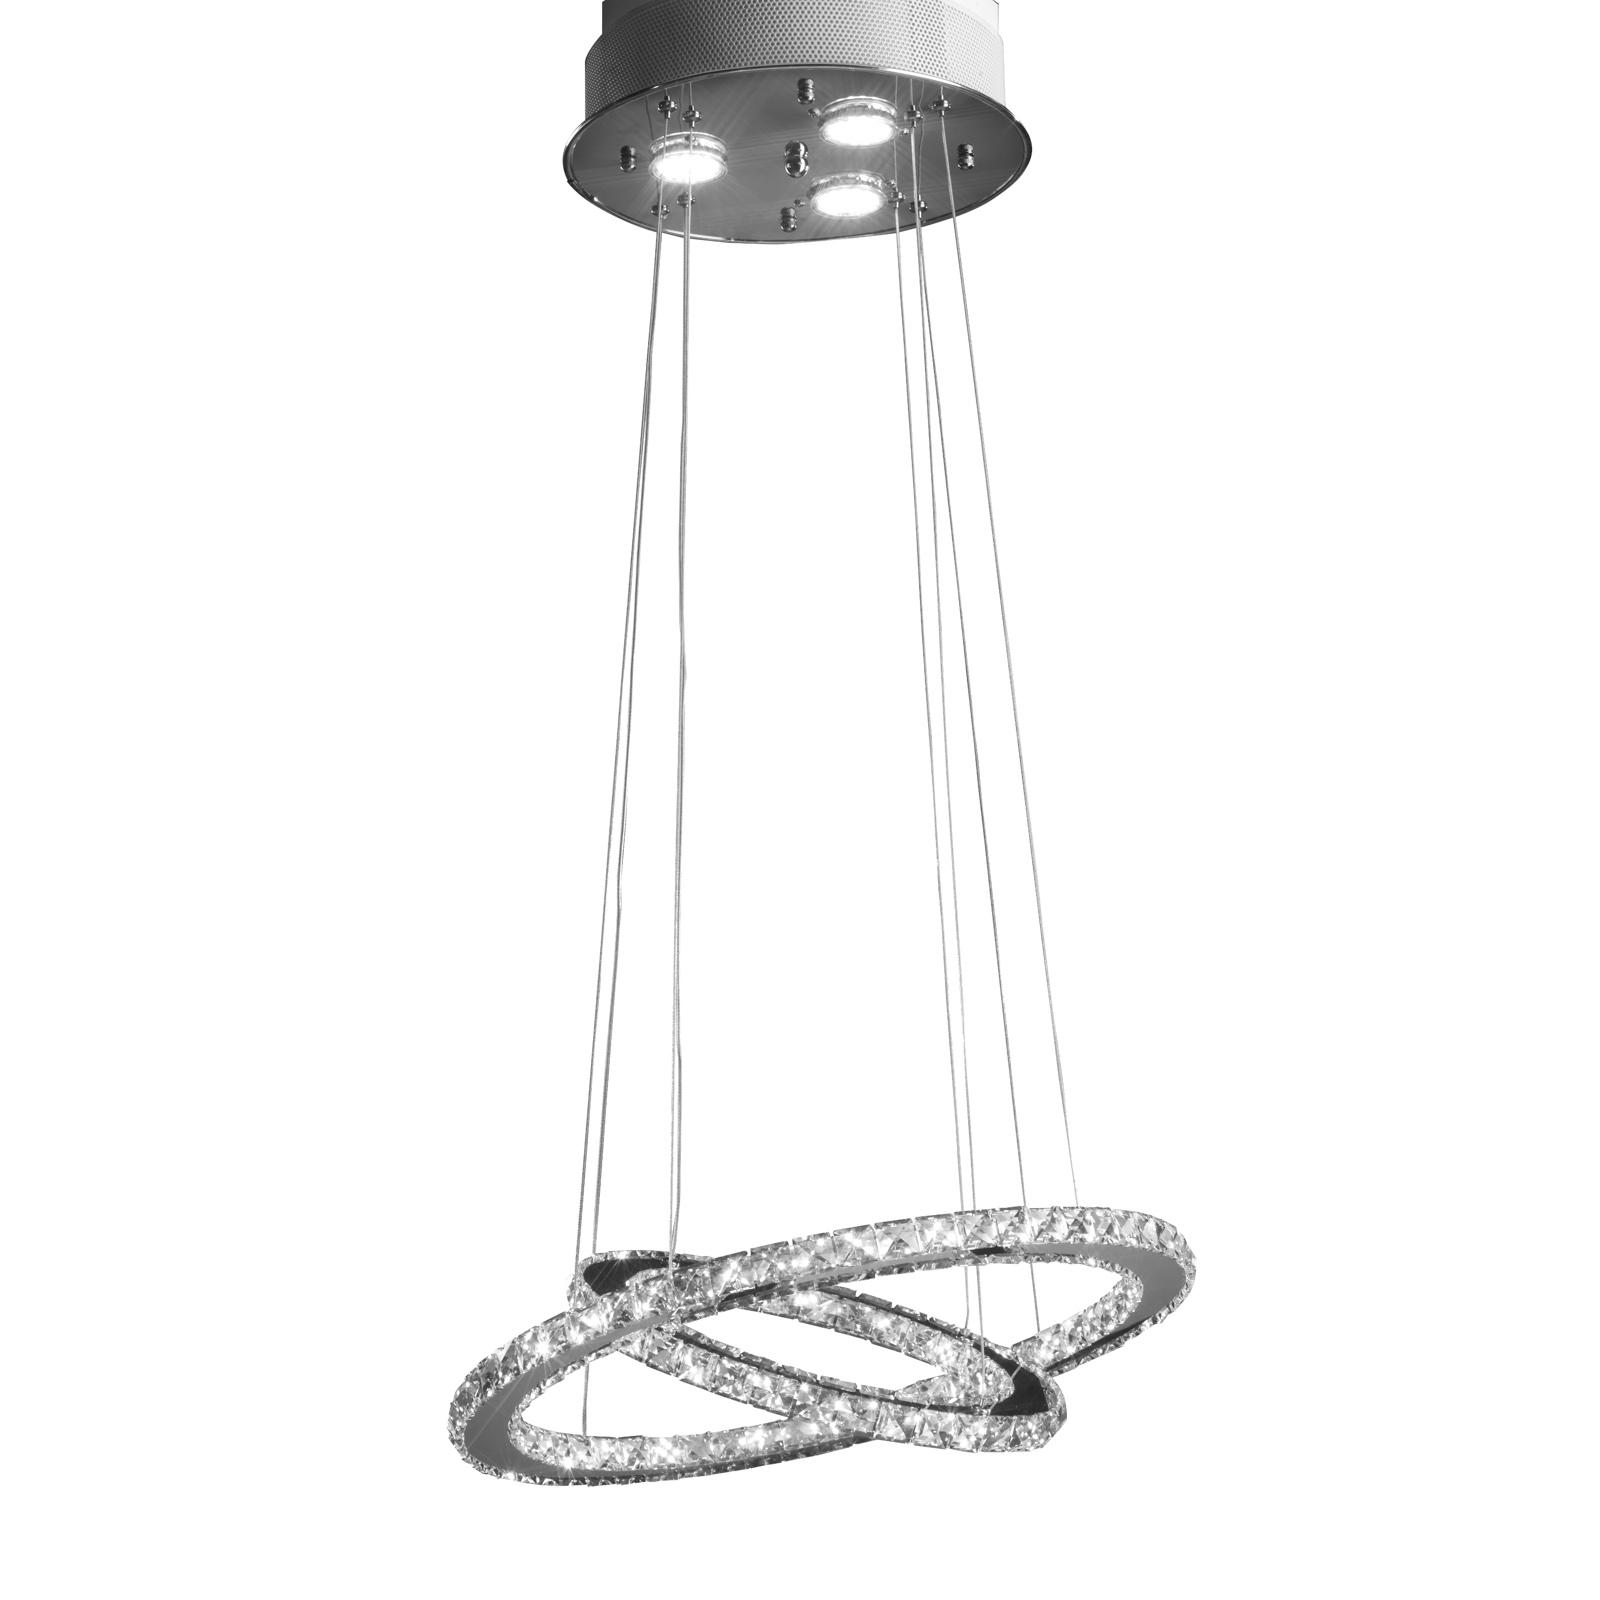 LED-hengelampe Saturno med krystallglass